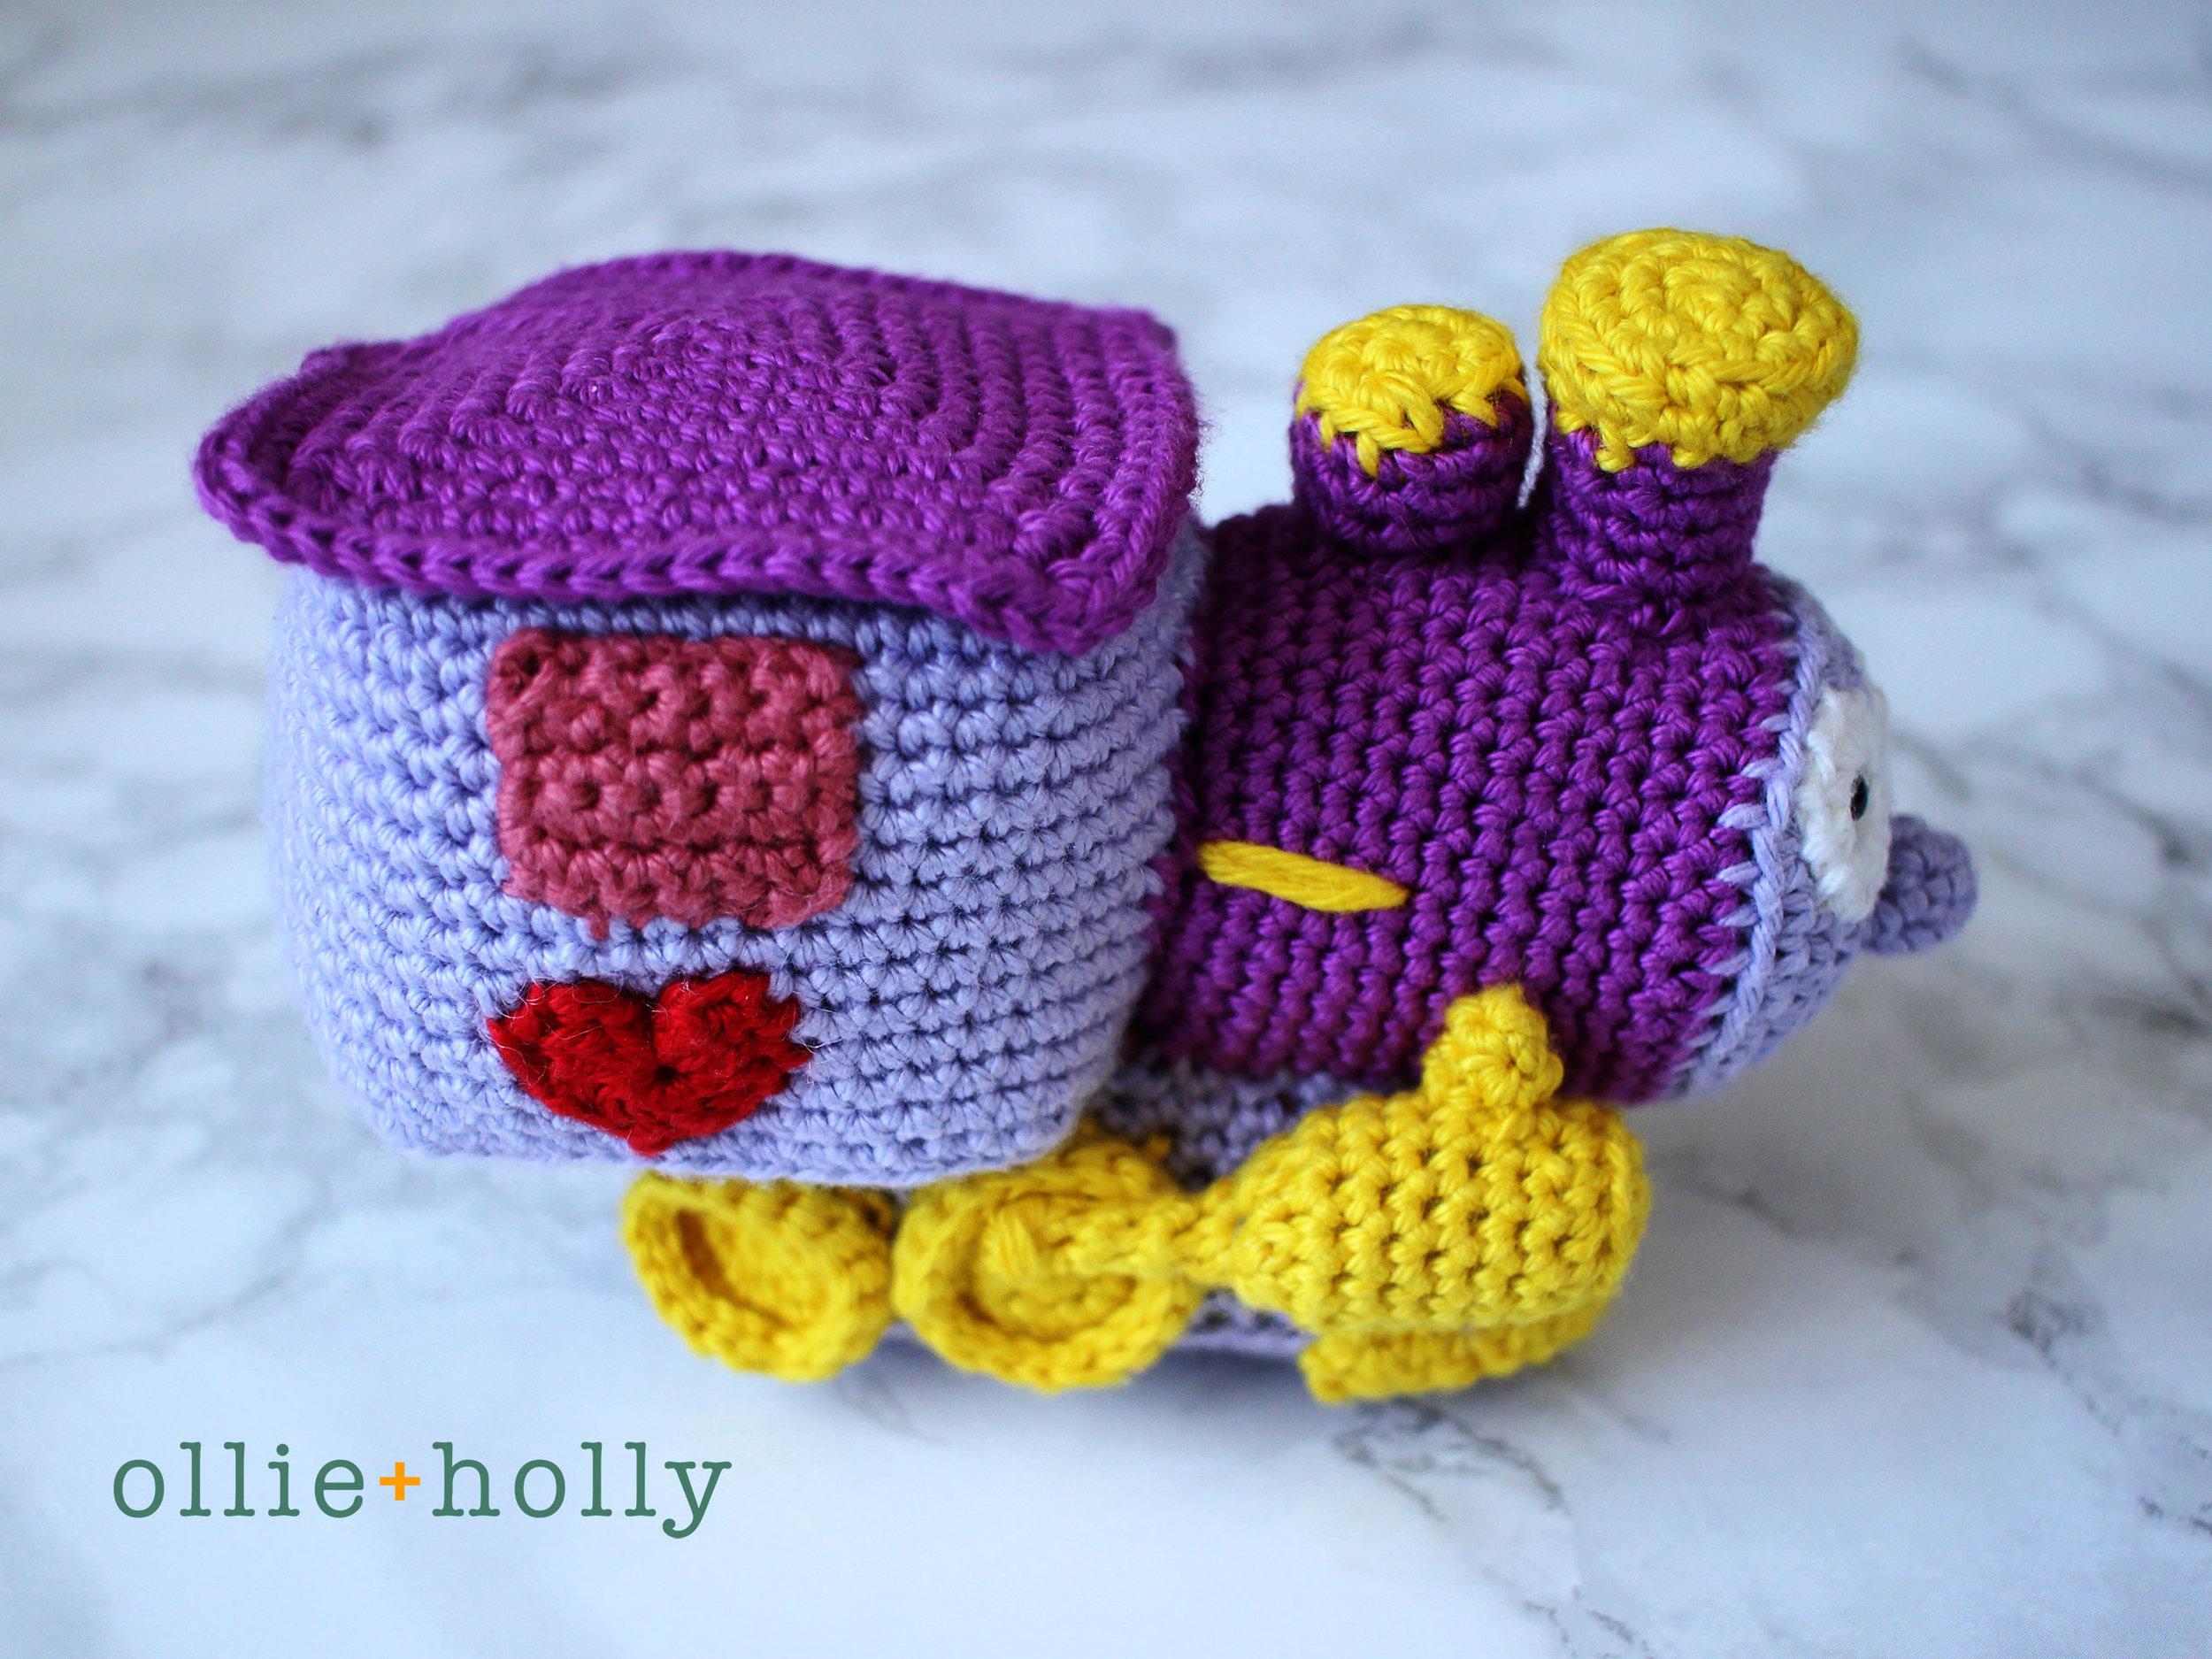 The Simpsons I Choo Choo Choose You Crochet Amigurumi Pattern Side View